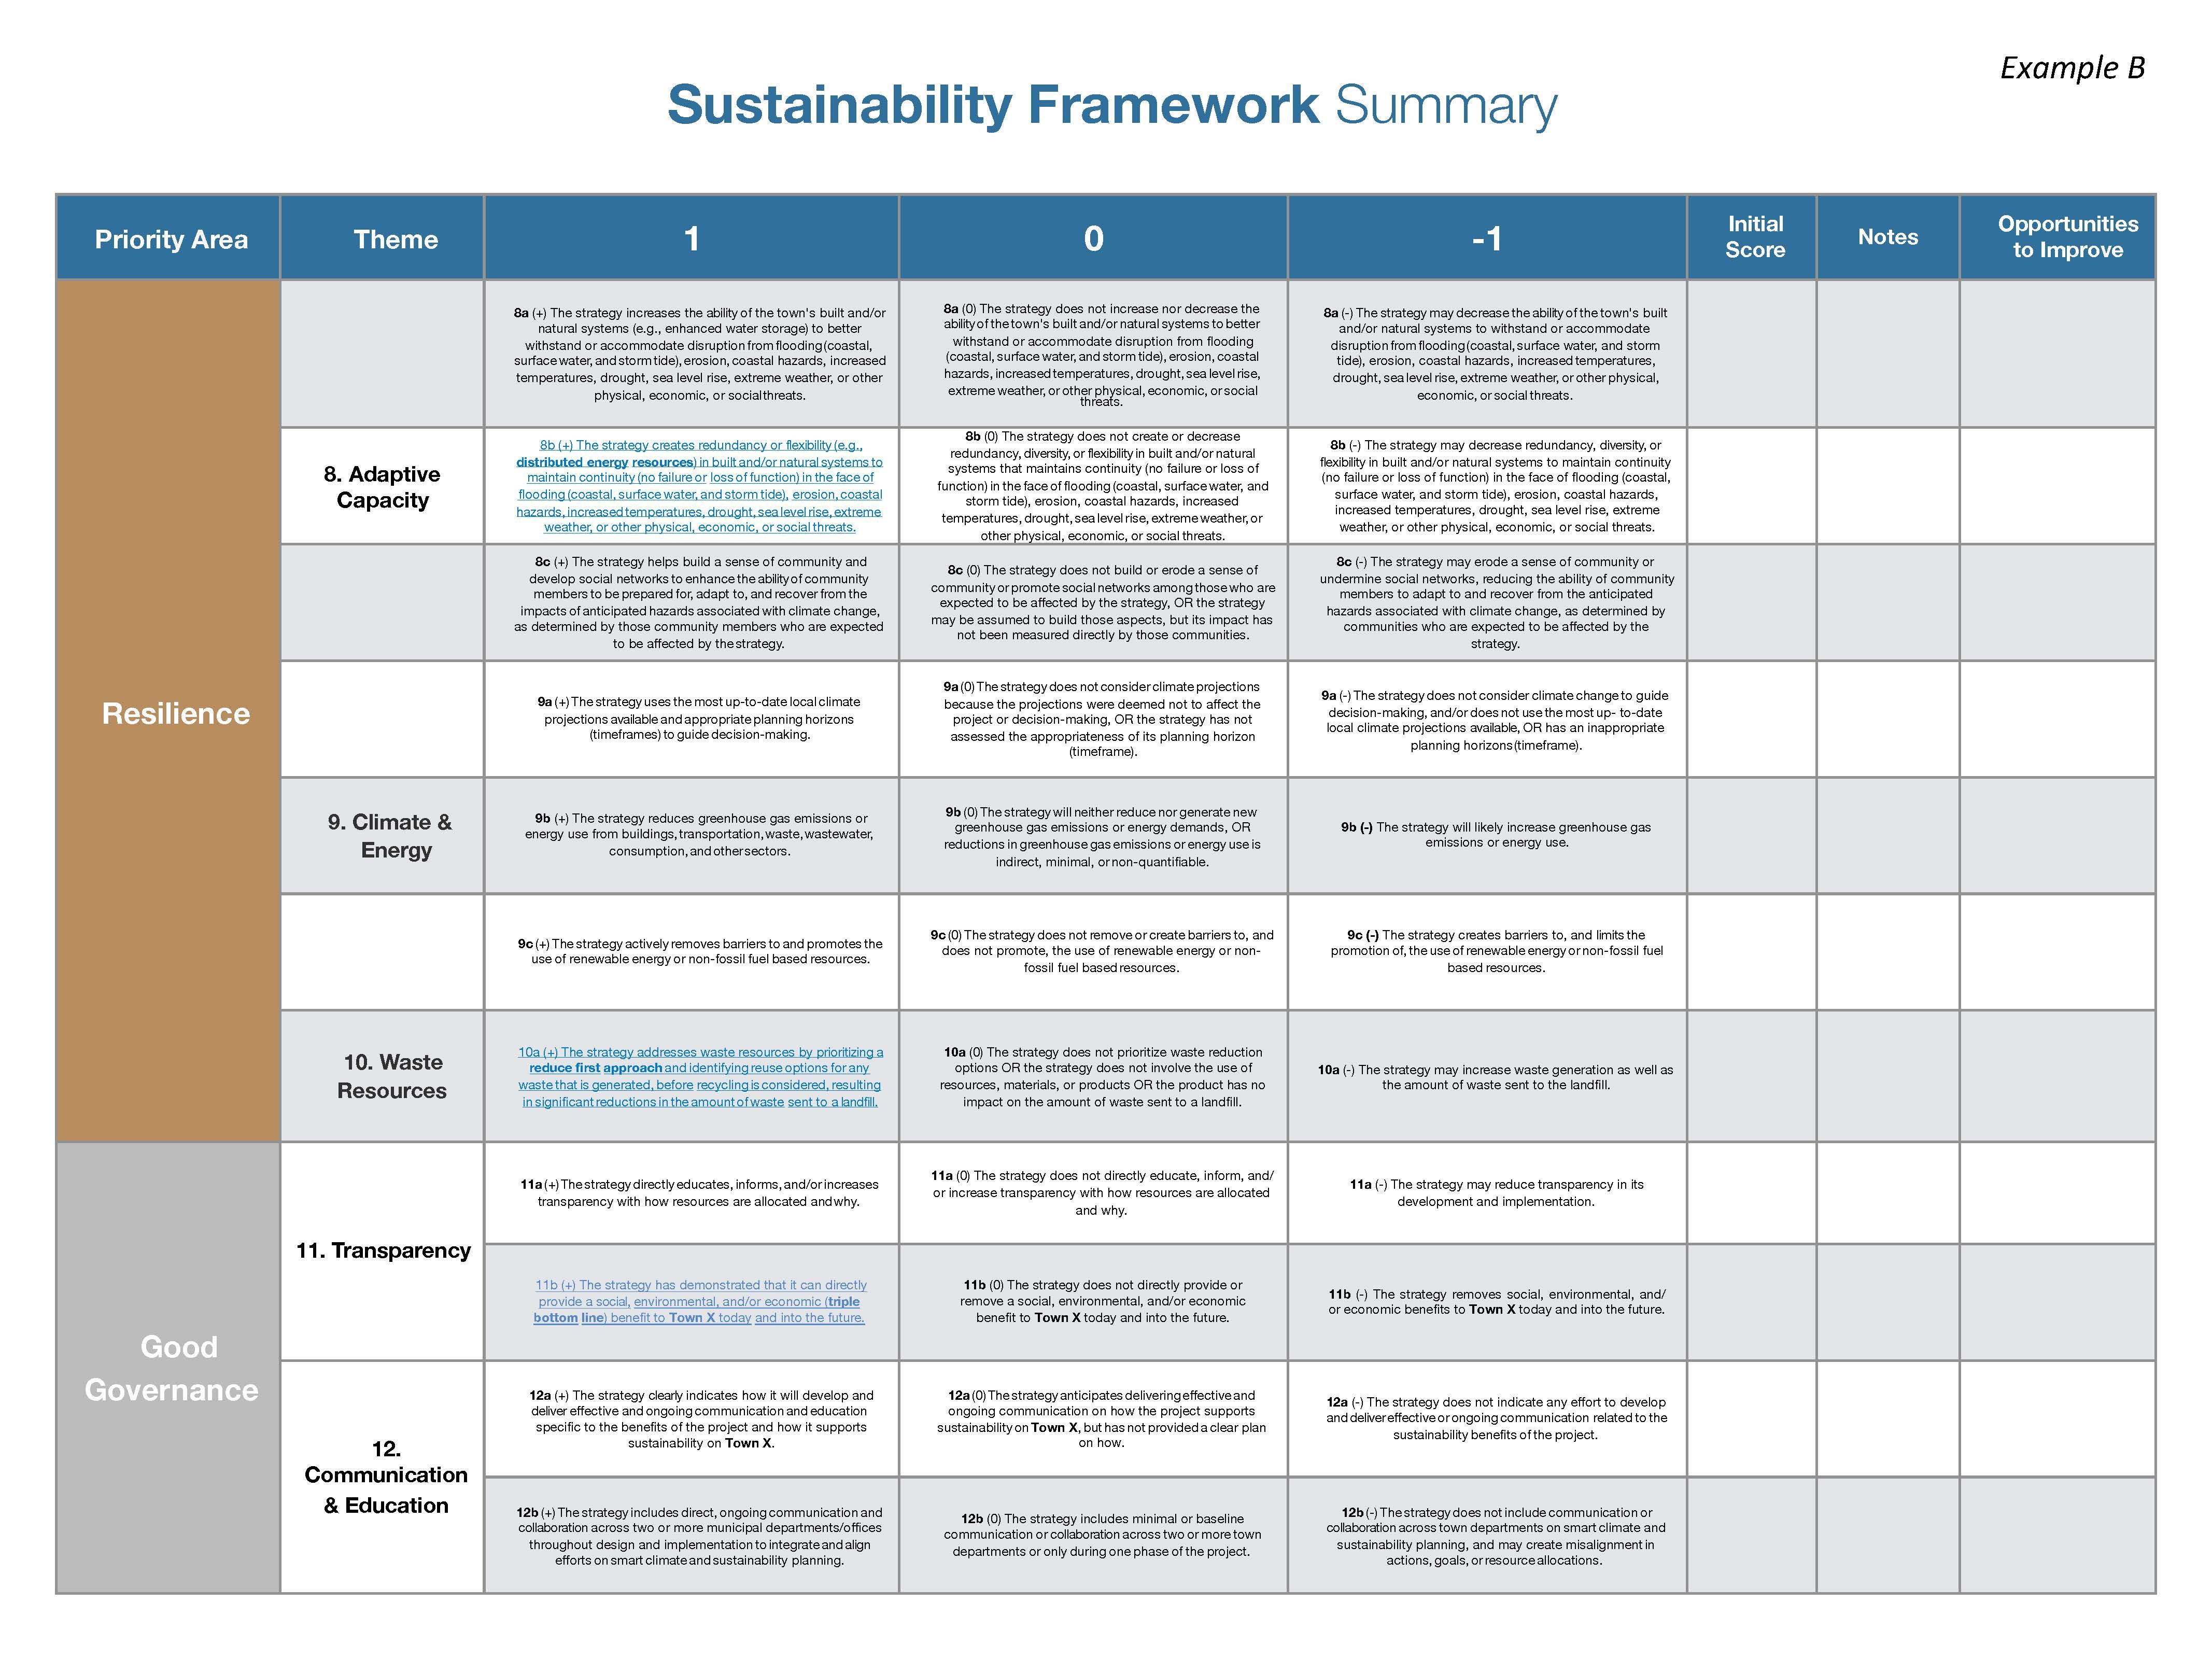 Example B Evaluation Framework - Complex